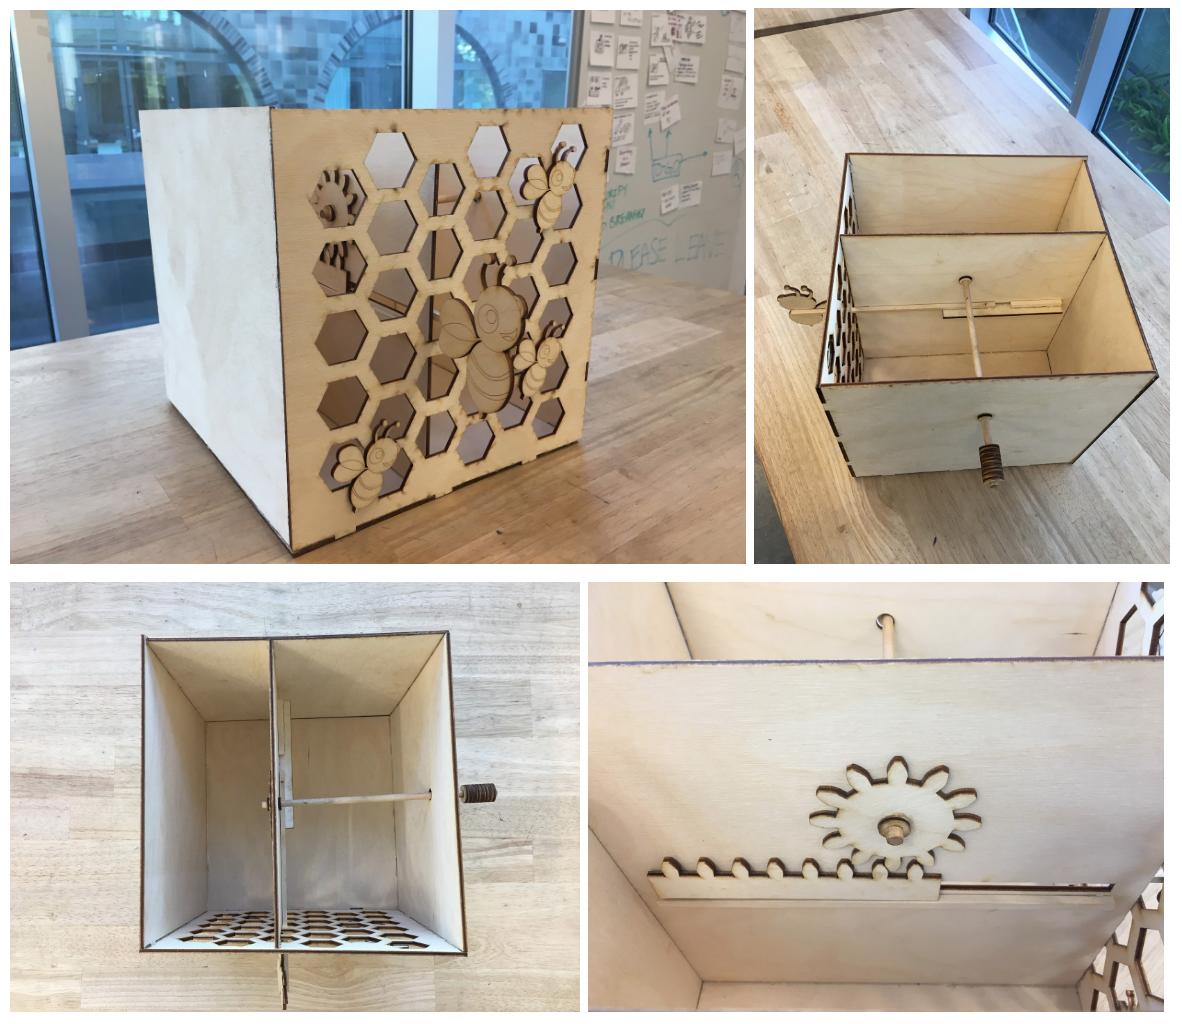 DI22 Hive Brief Iteration 1 Process.png